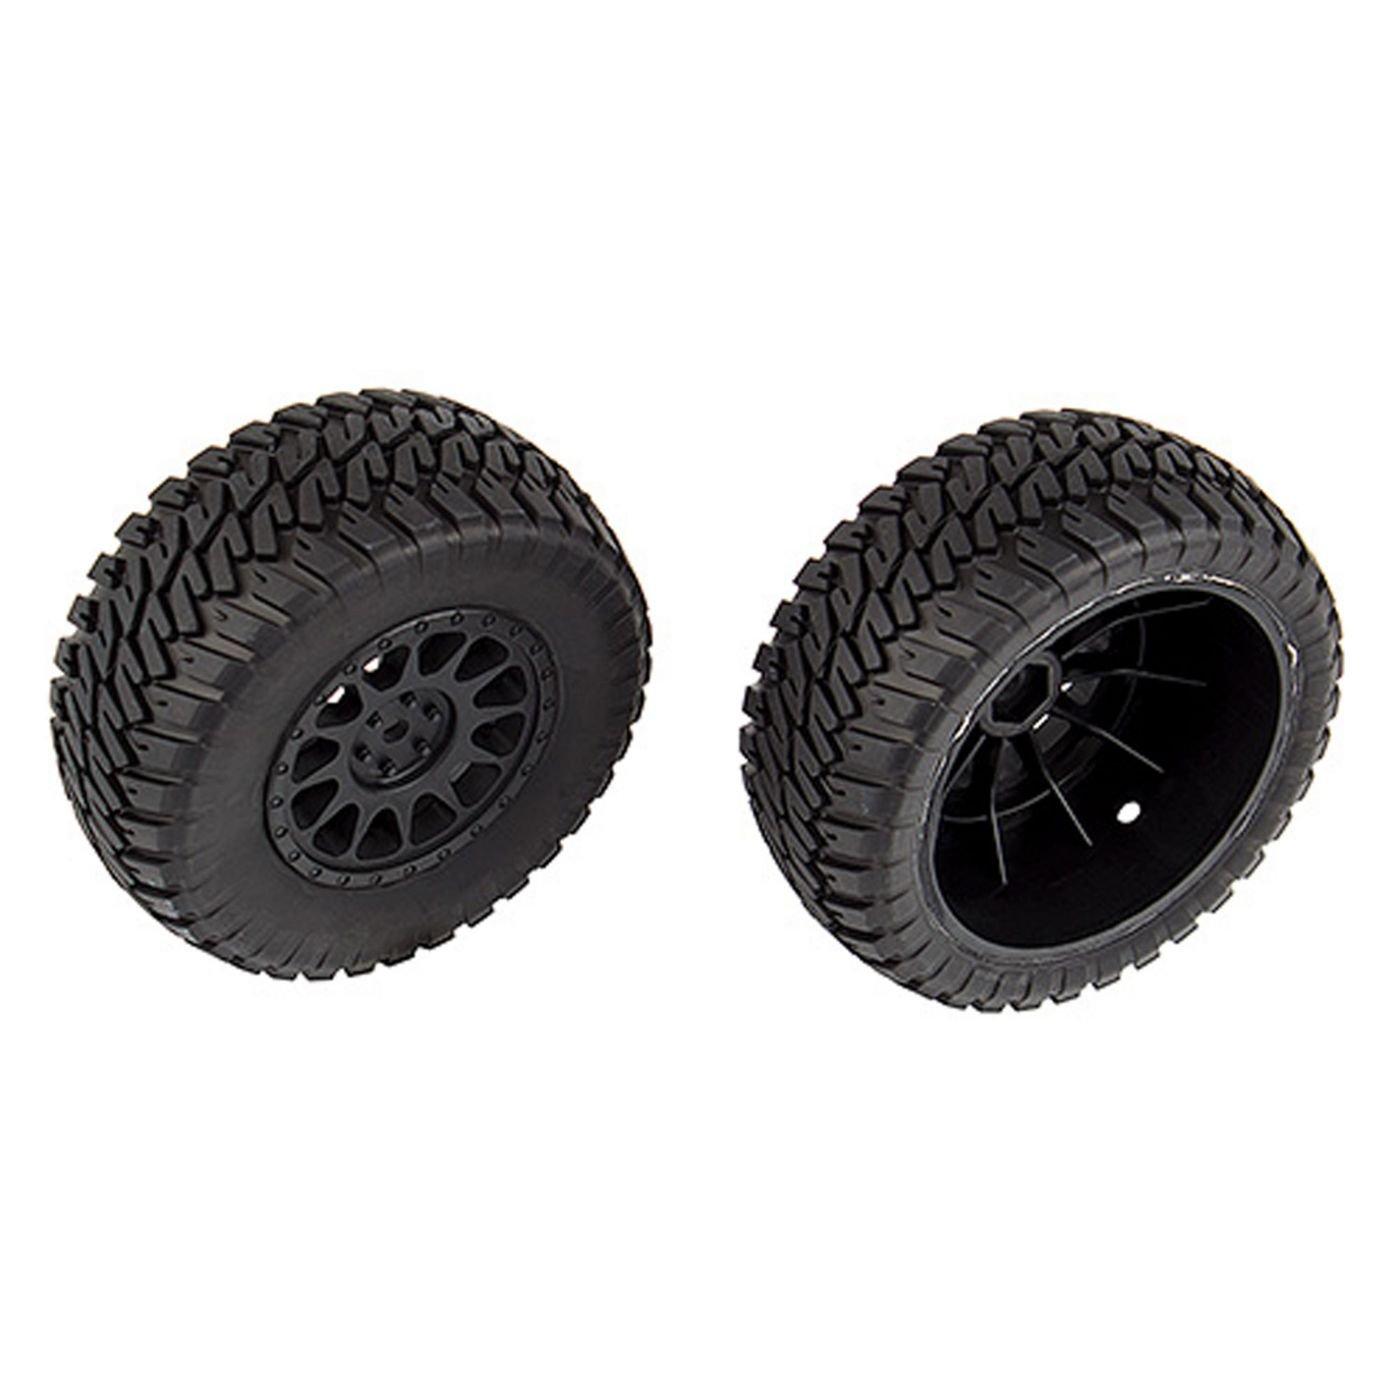 Team Associated Multi-terrain Tires and Method Wheels mounted